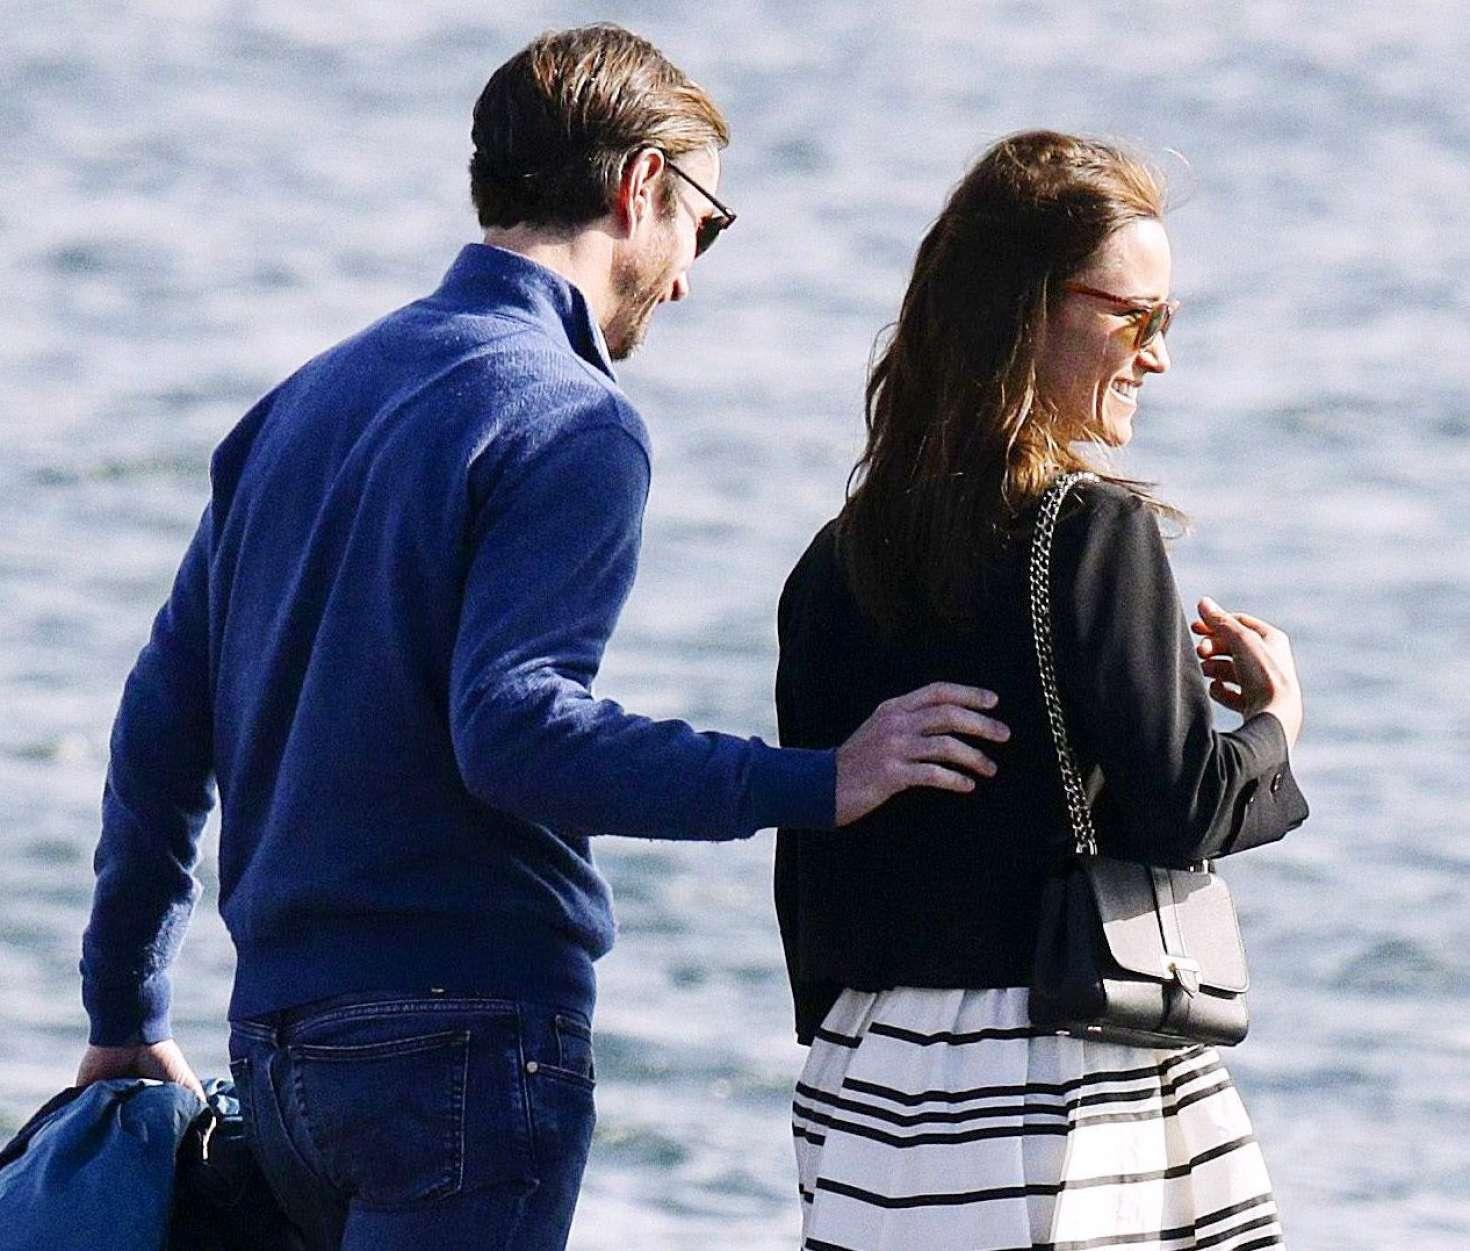 Pippa dating Matthews